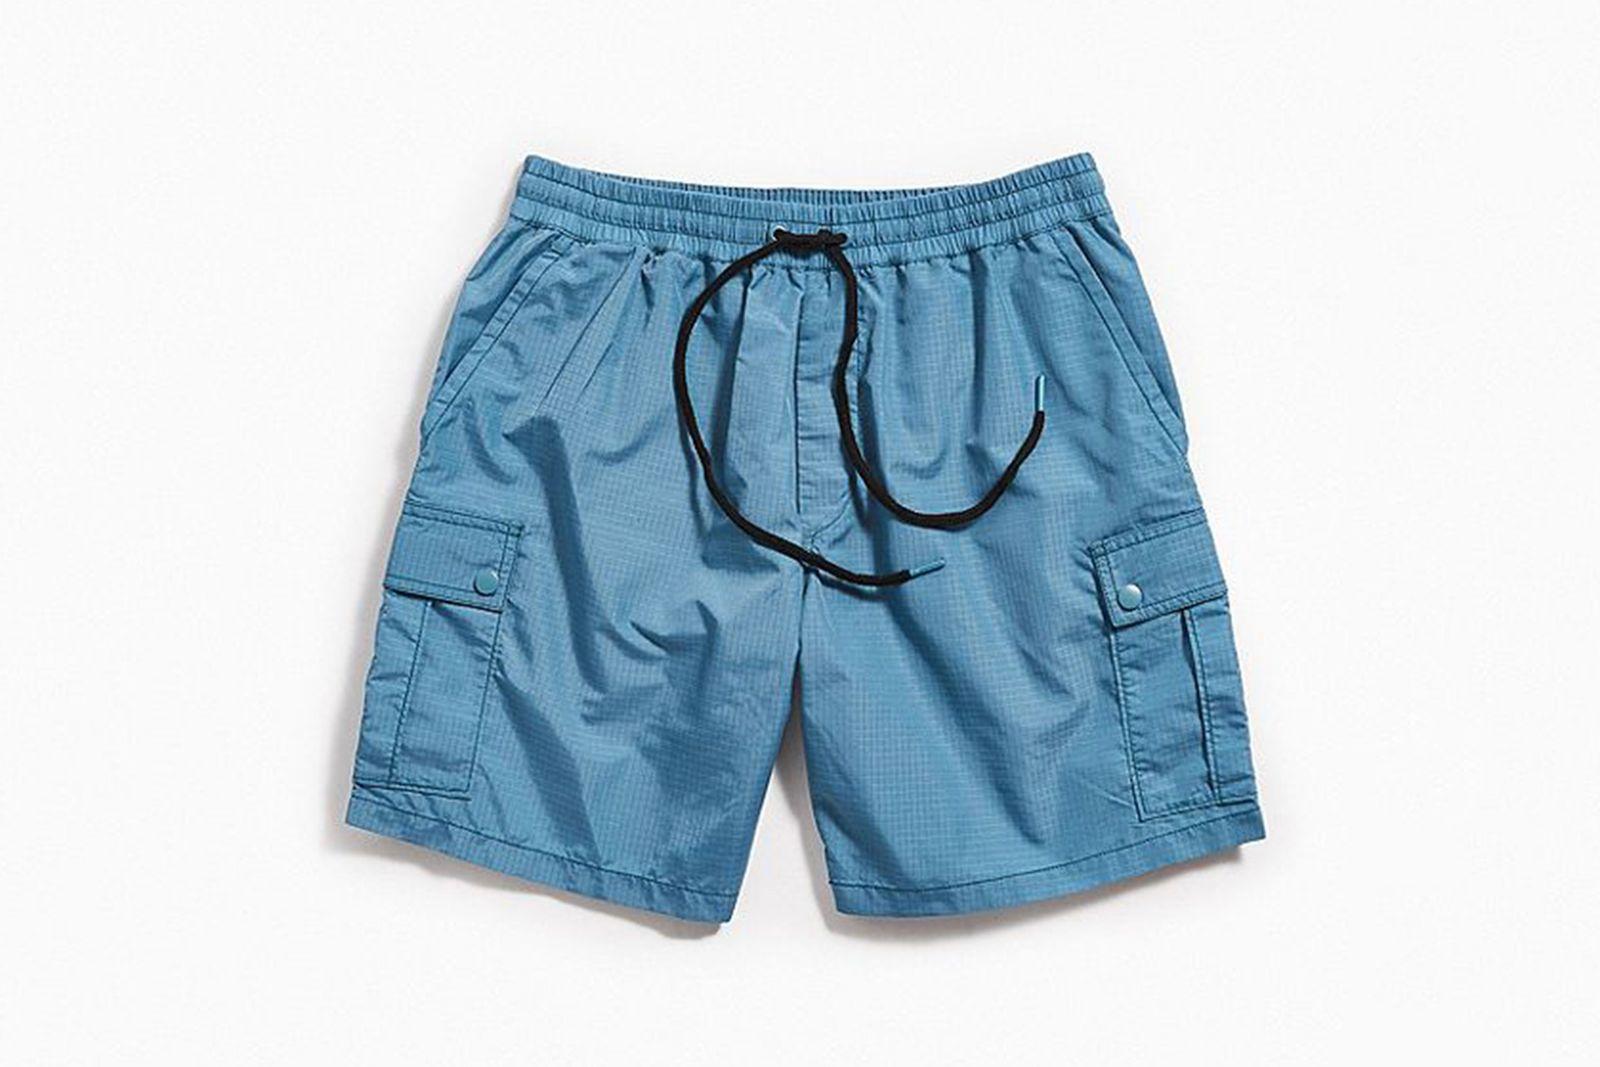 UO Ripstop Nylon Cargo Shorts Guess Stüssy fila